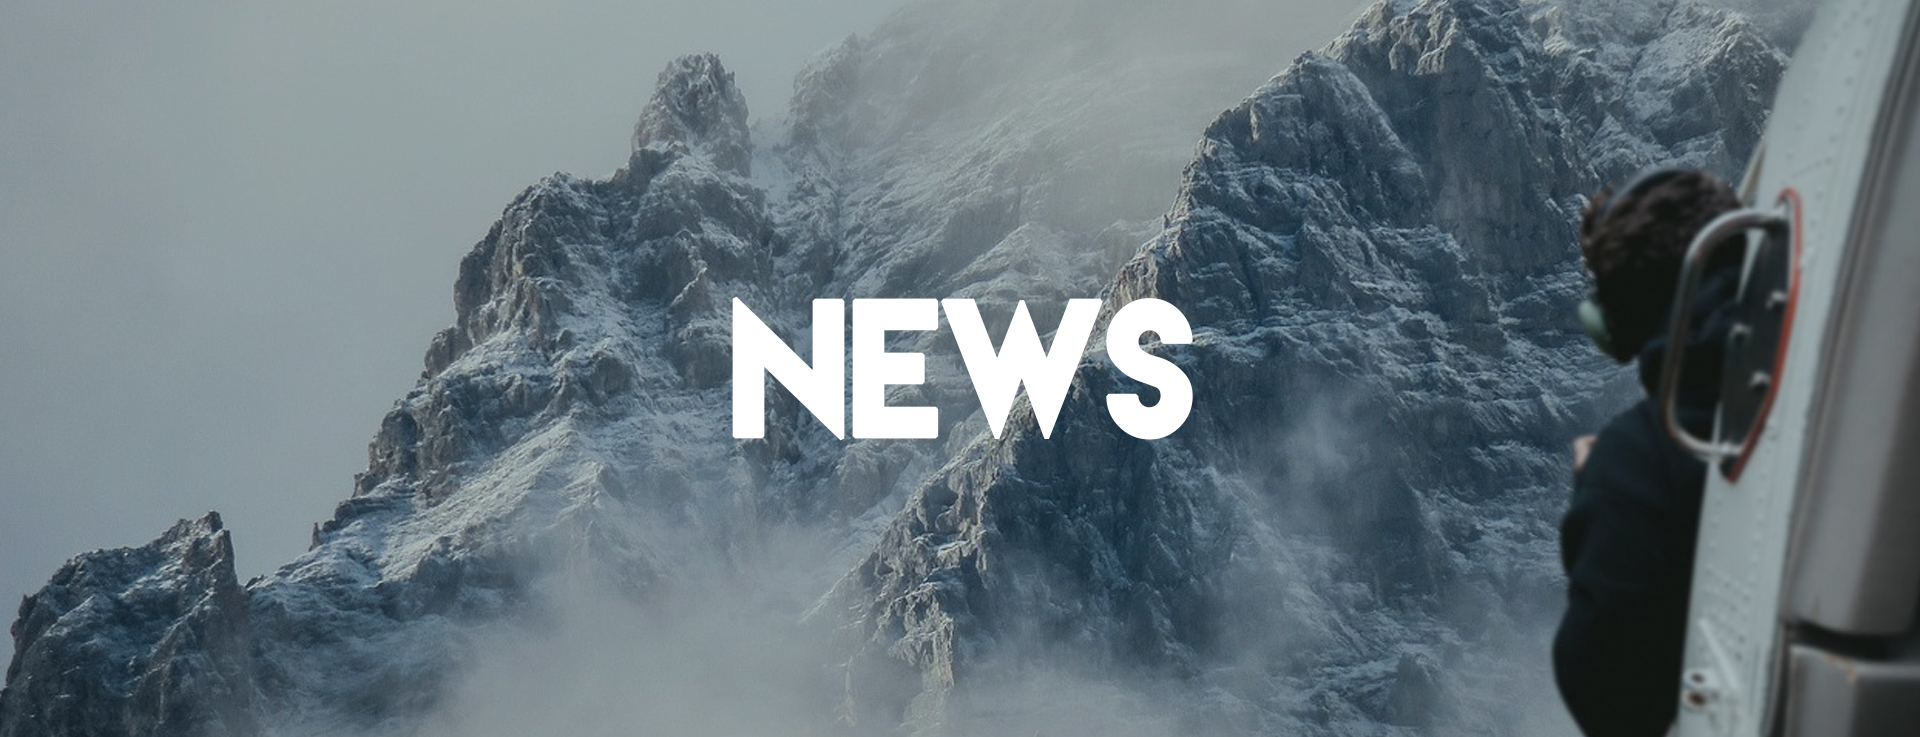 Sylvain Berard - News